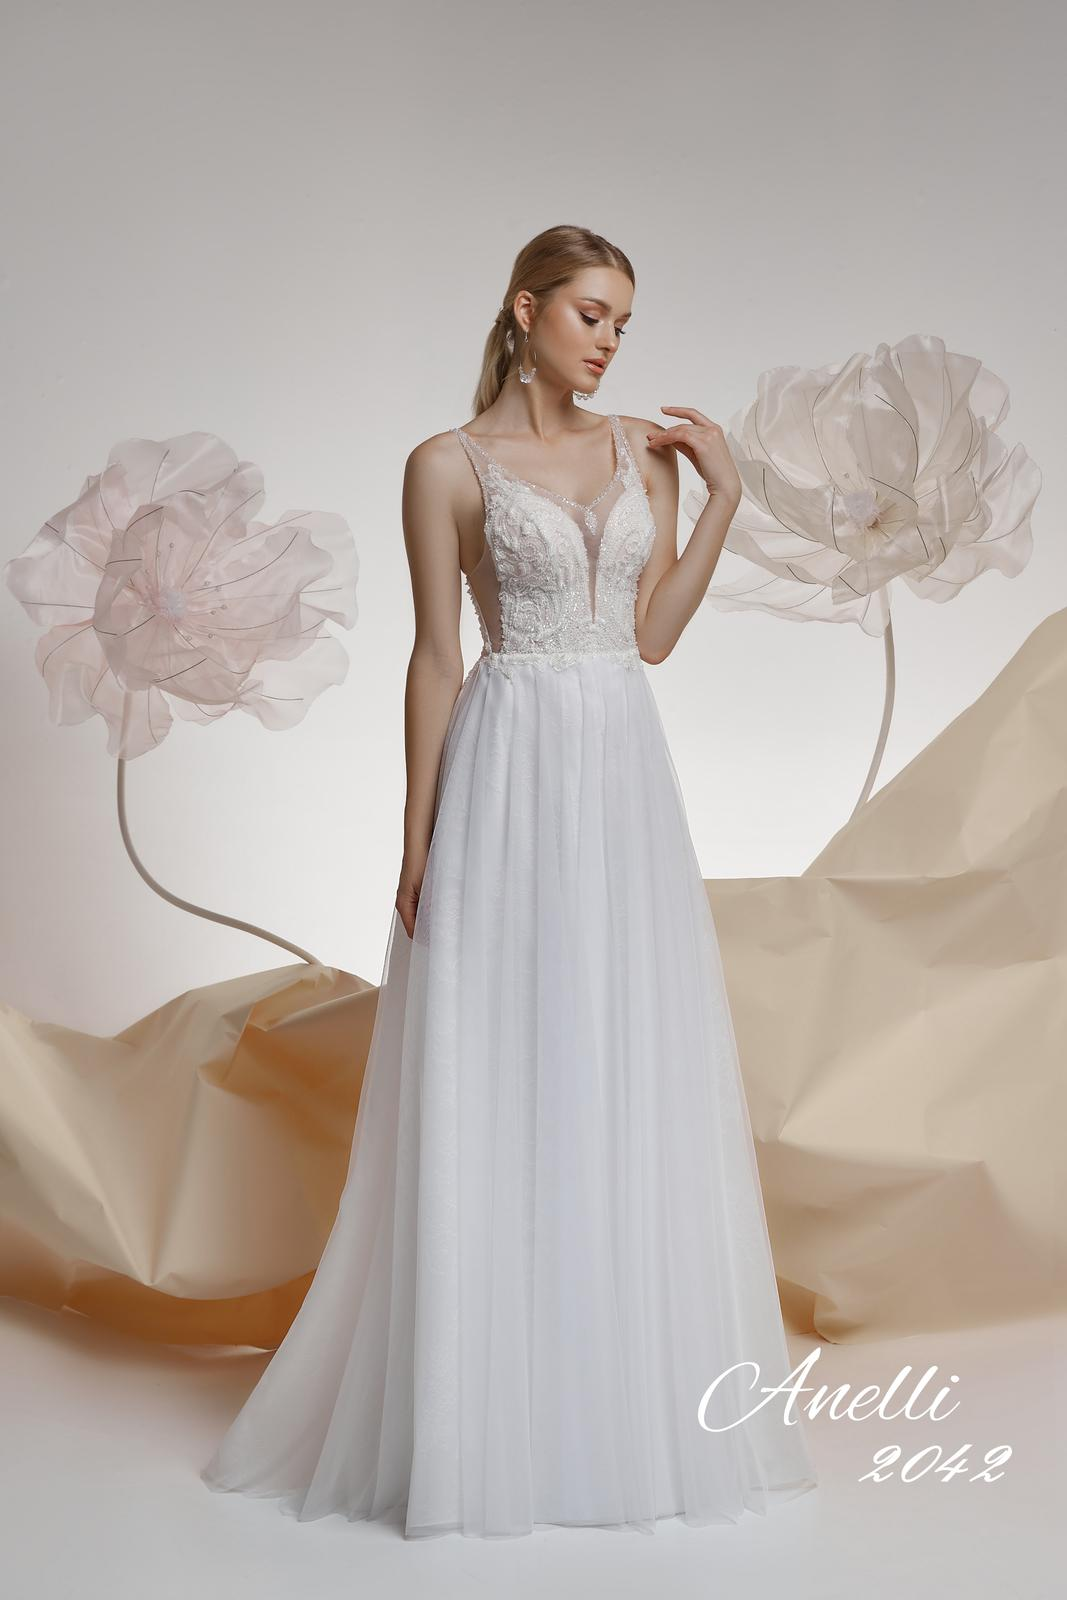 Svadobné šaty - Imagine 2042 - Obrázok č. 1